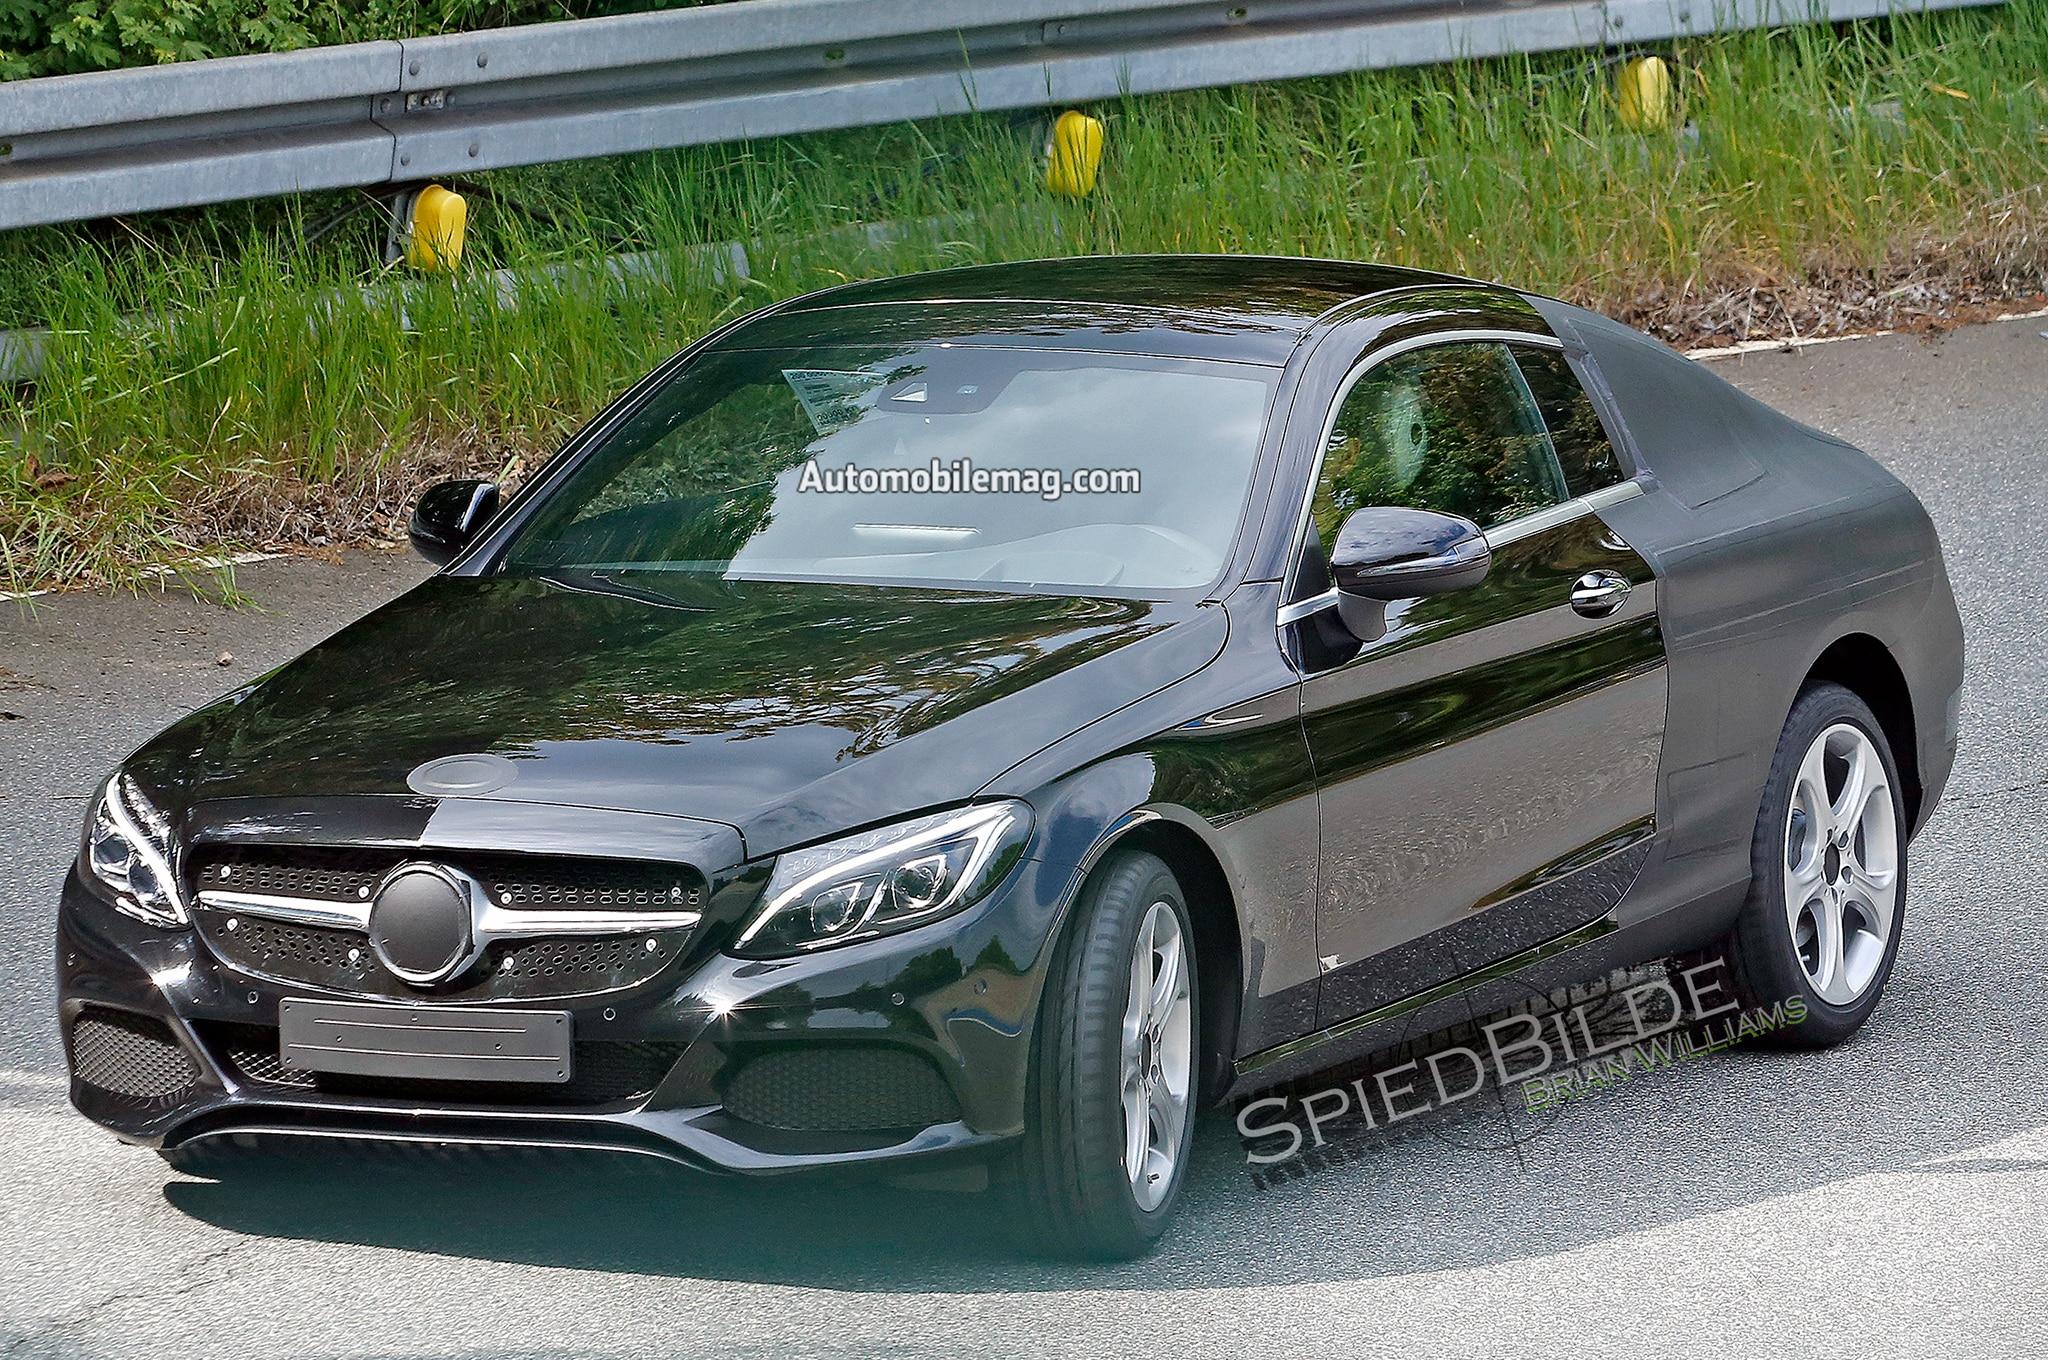 Report: 2016 Mercedes-Benz C-Class Coupe Sacrifices Space for Sport